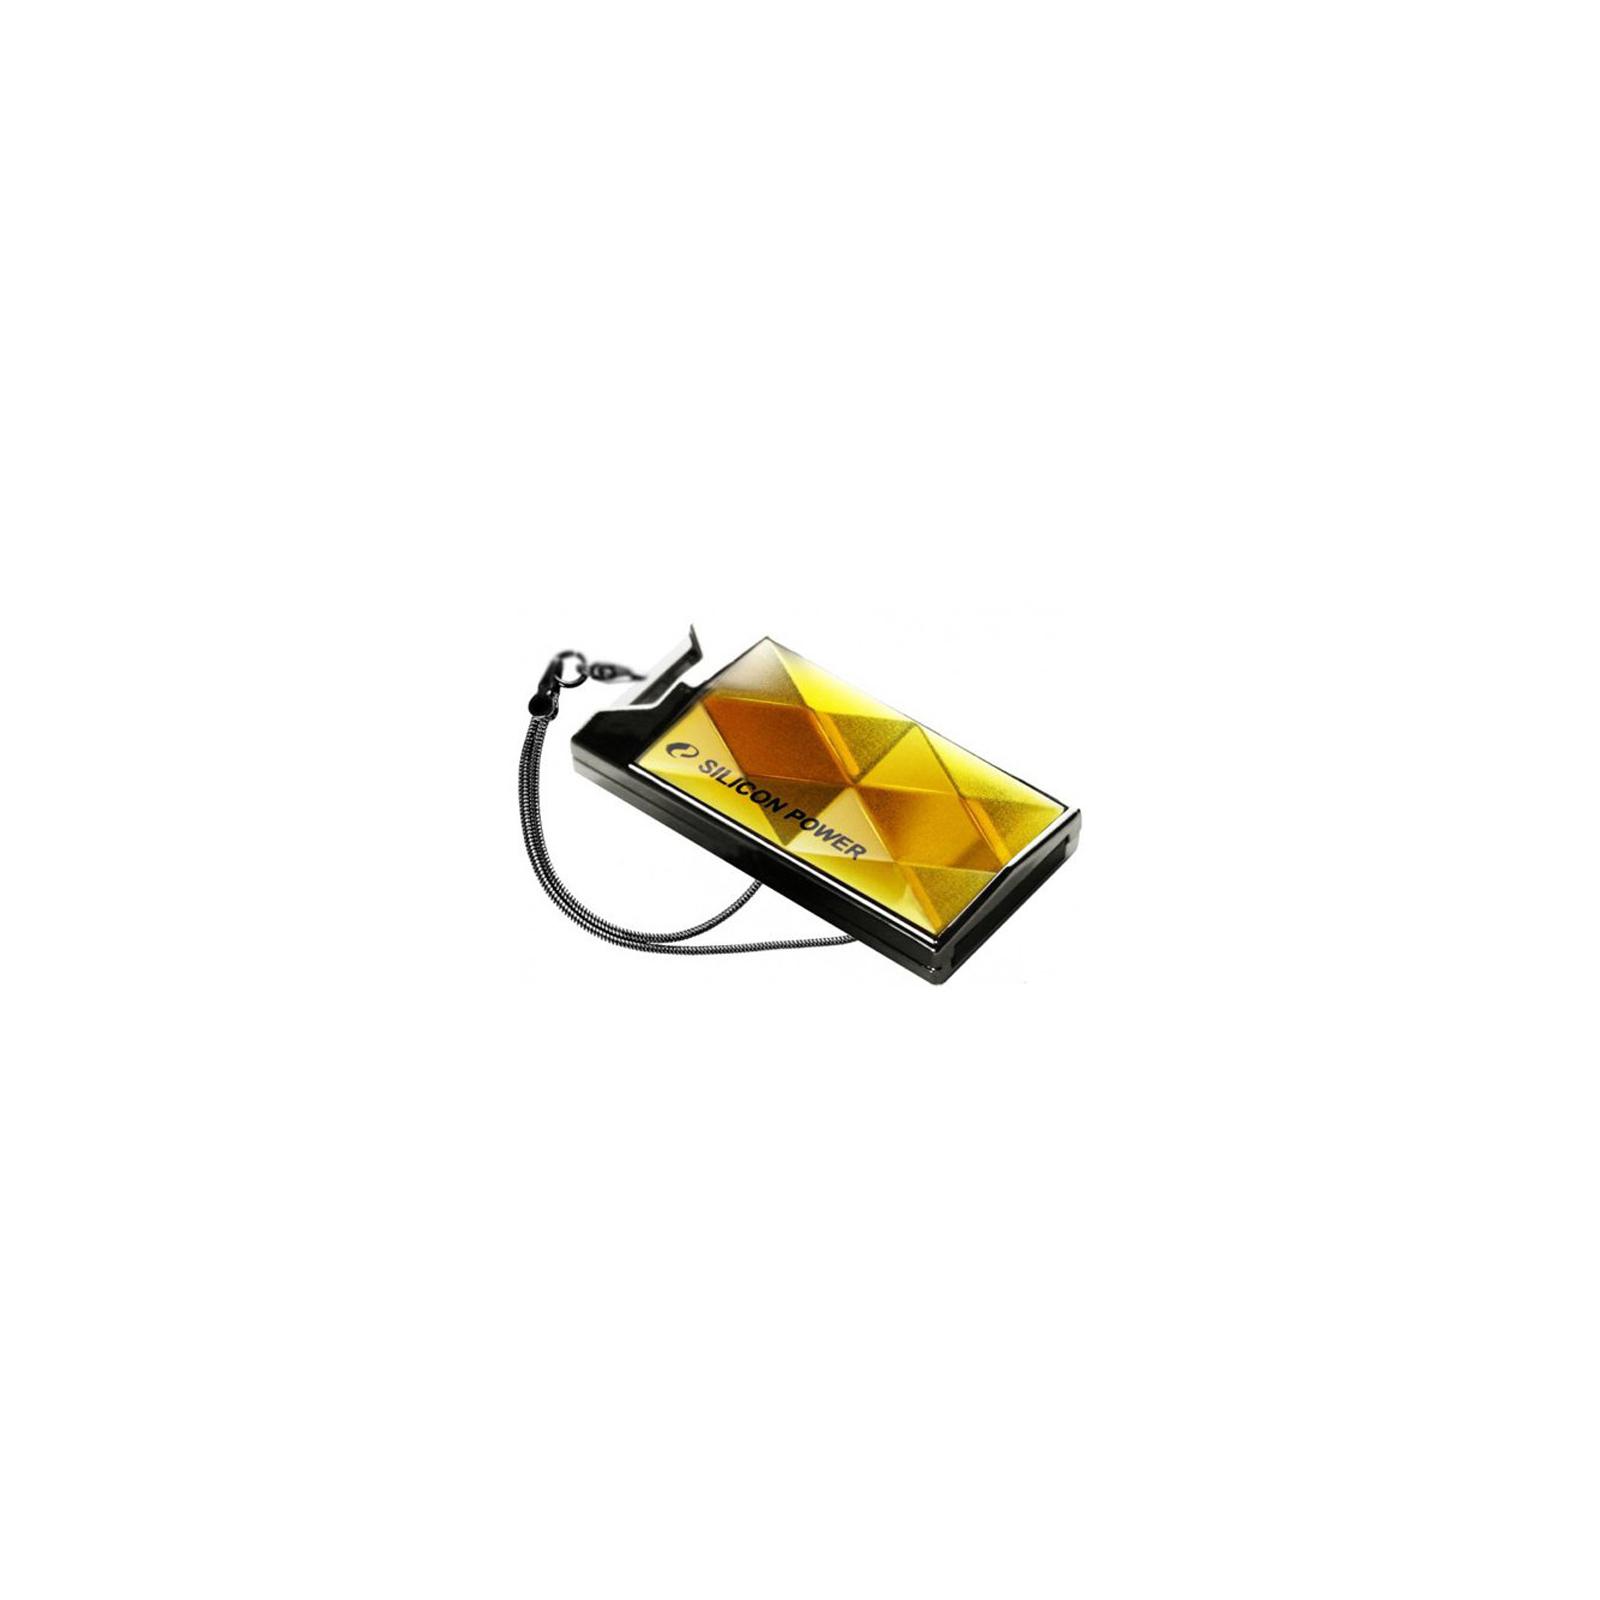 USB флеш накопитель Silicon Power 16Gb Touch 850 titanium (SP016GBUF2850V1T)